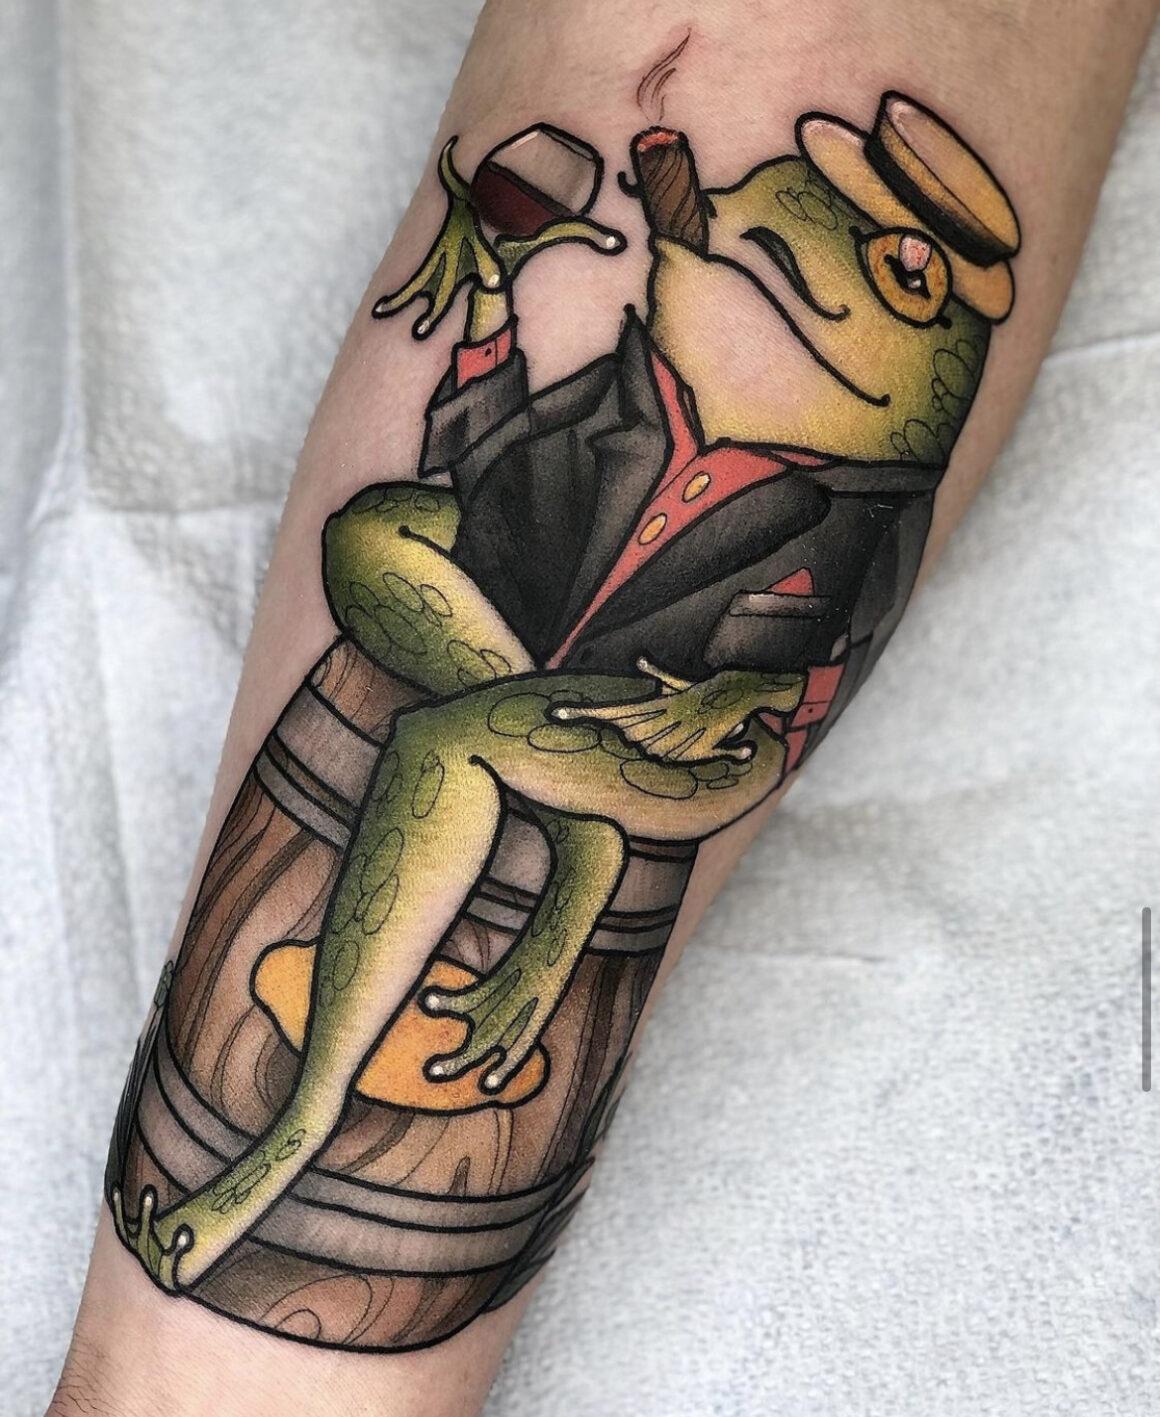 Kira Knowlton, White Lodge Tattoo And Gallery, Glenwood Springs, USA